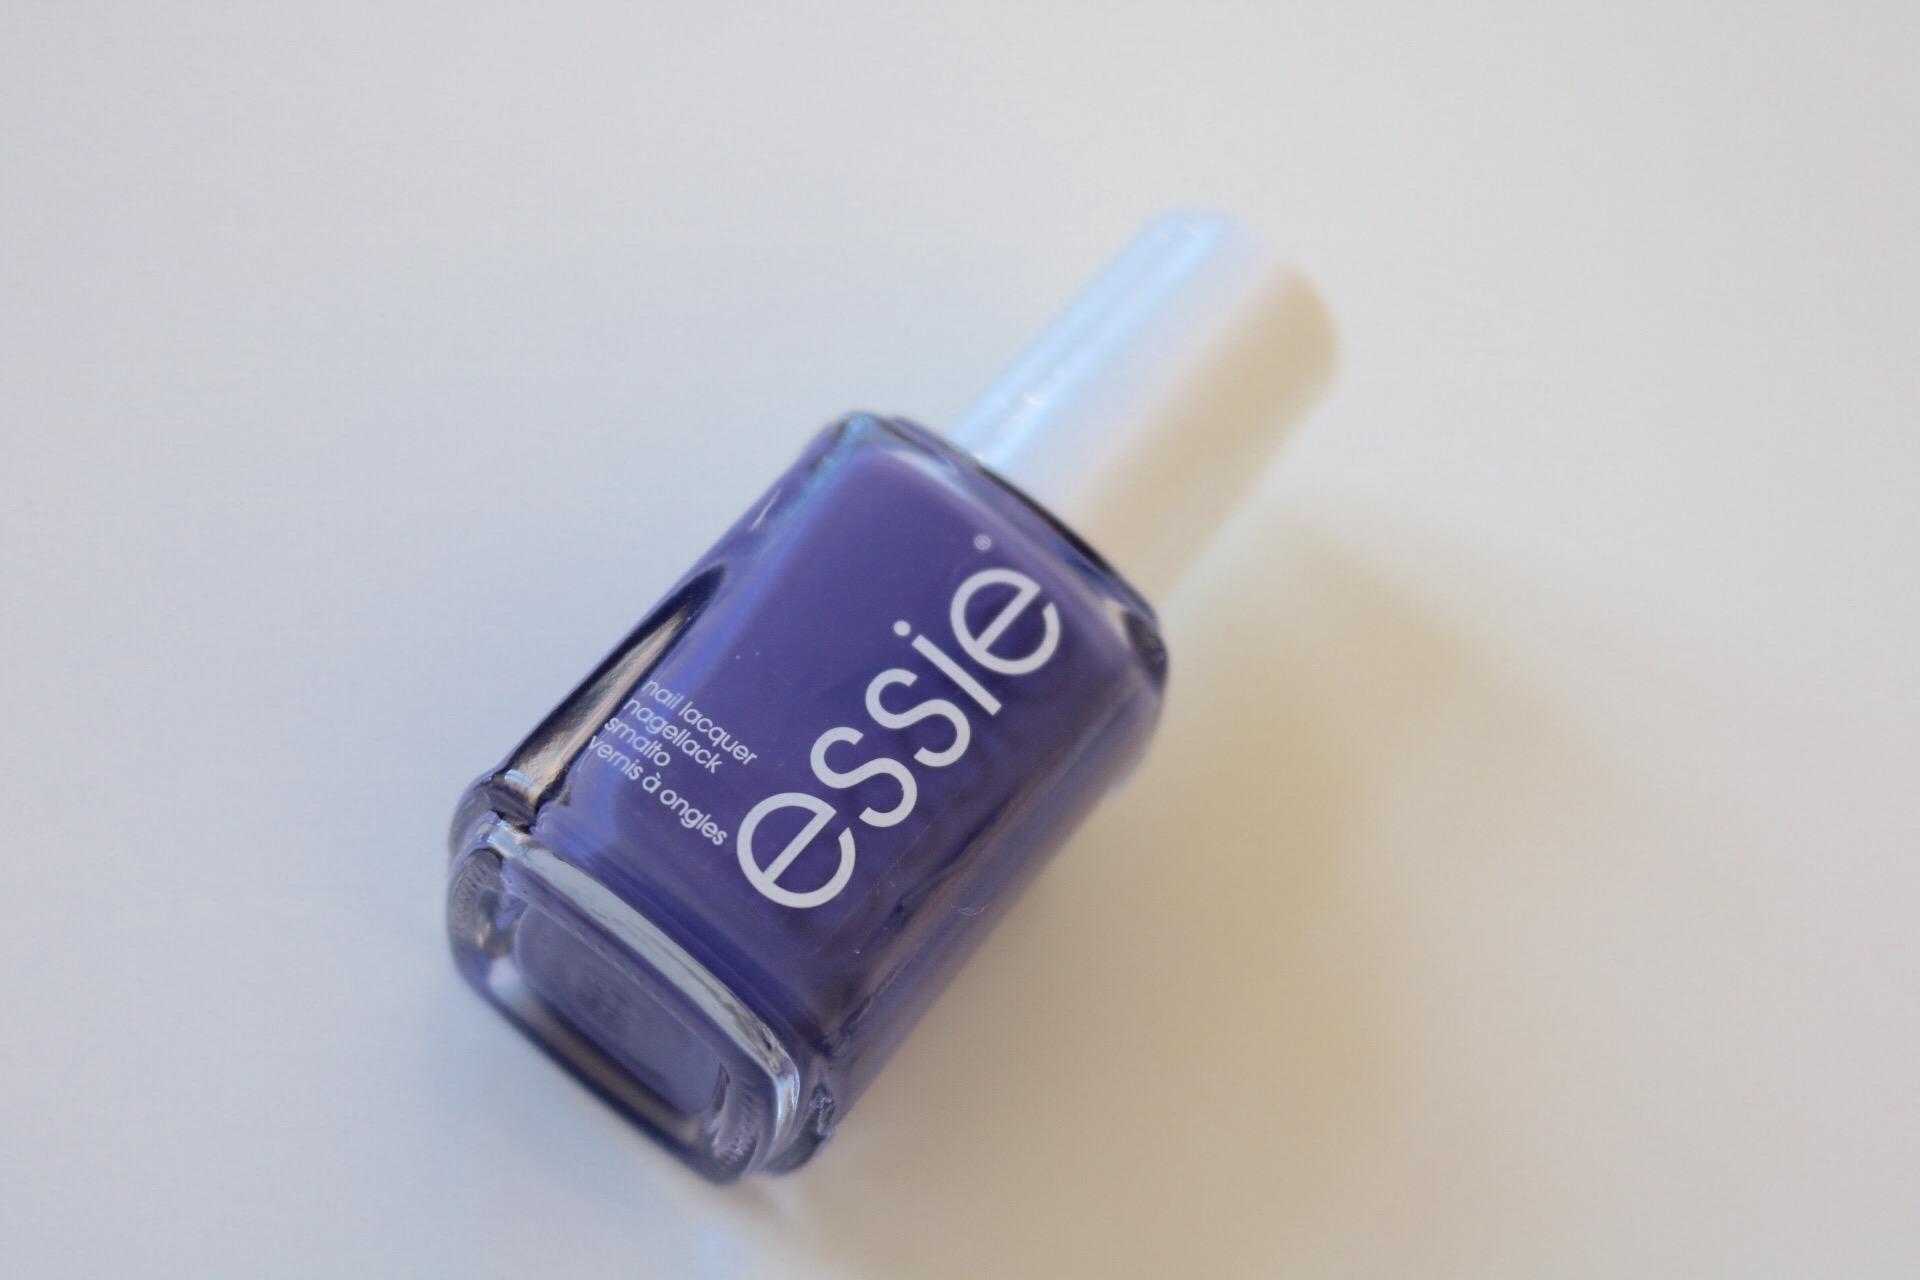 Essie Suite Retreat test lila blå nagellack amandahans skönhetsblogg